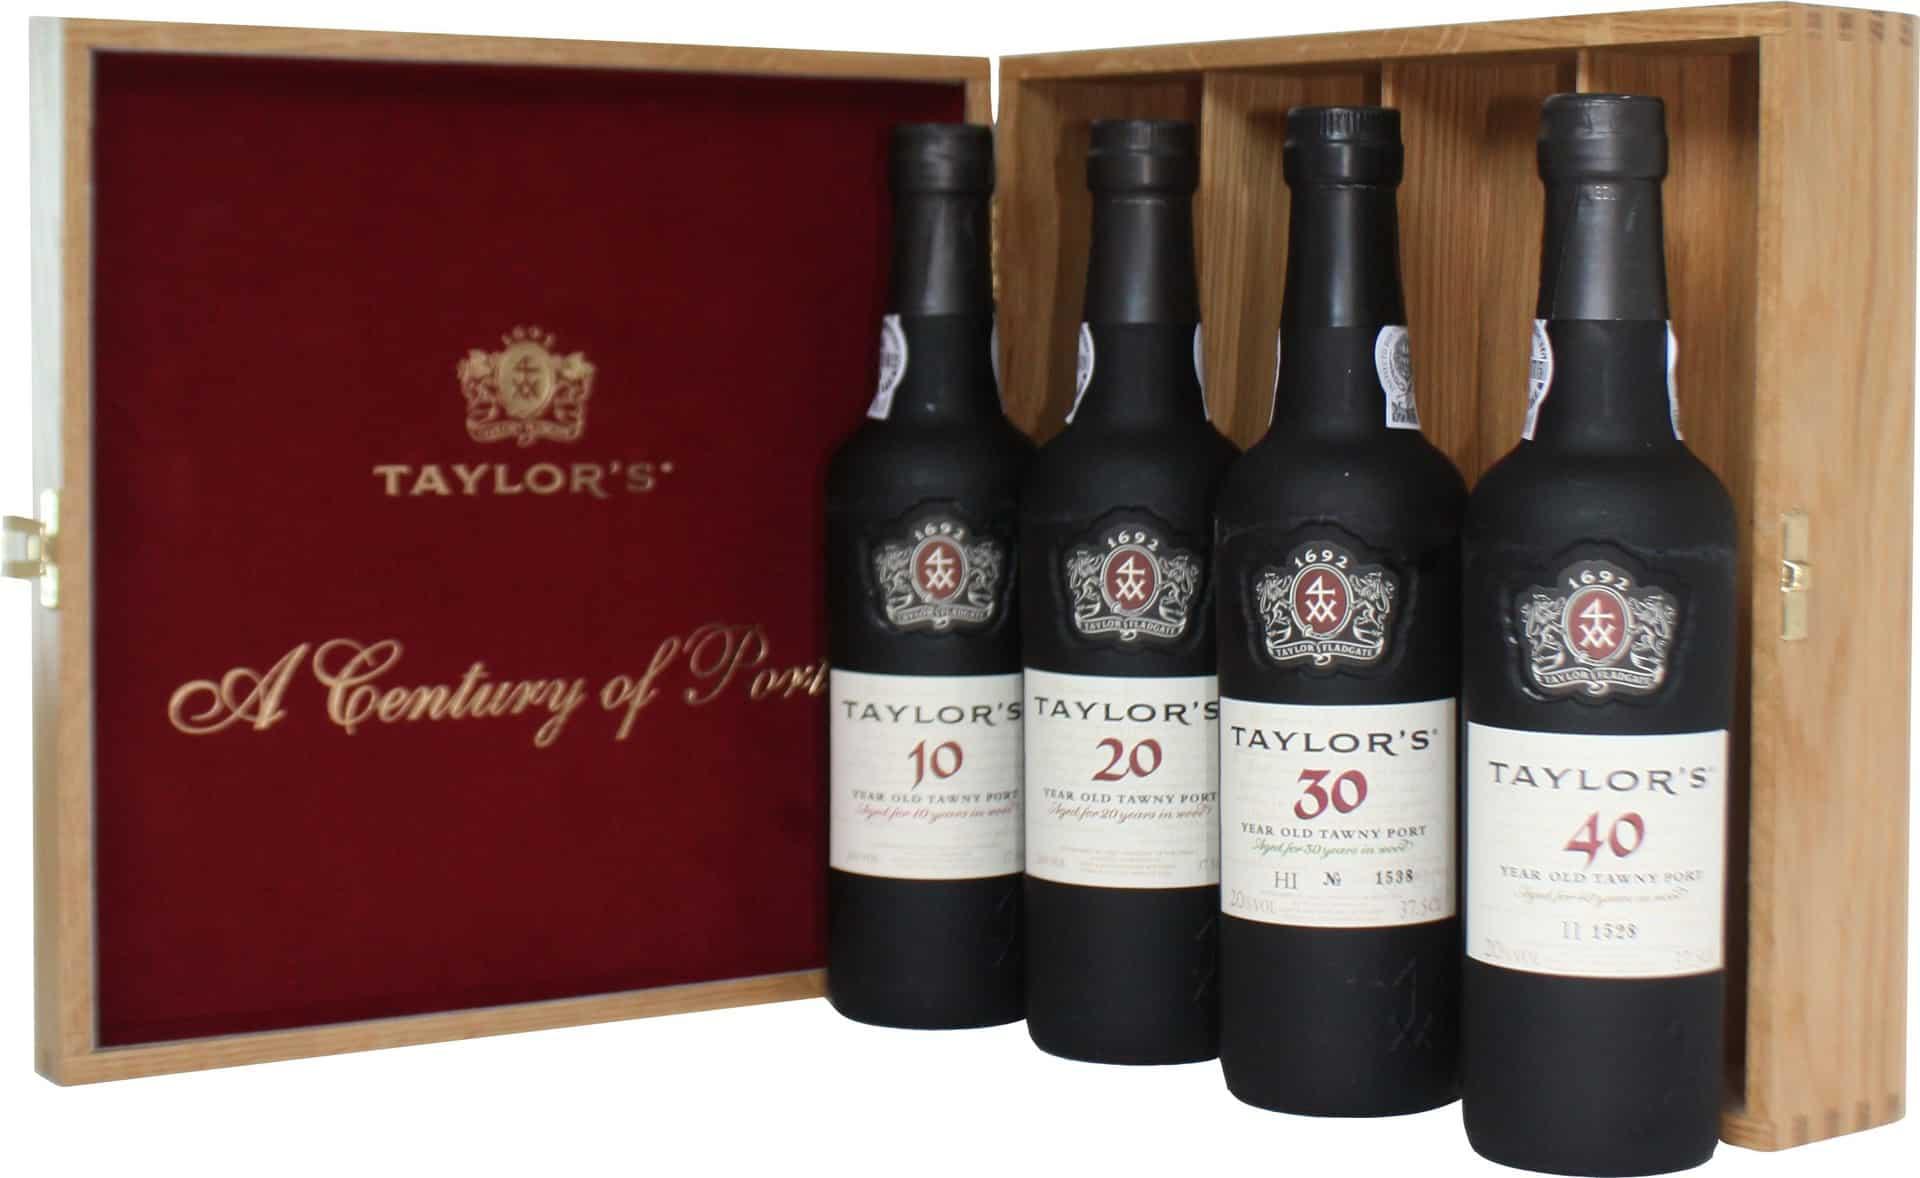 Taylor's Century of Port